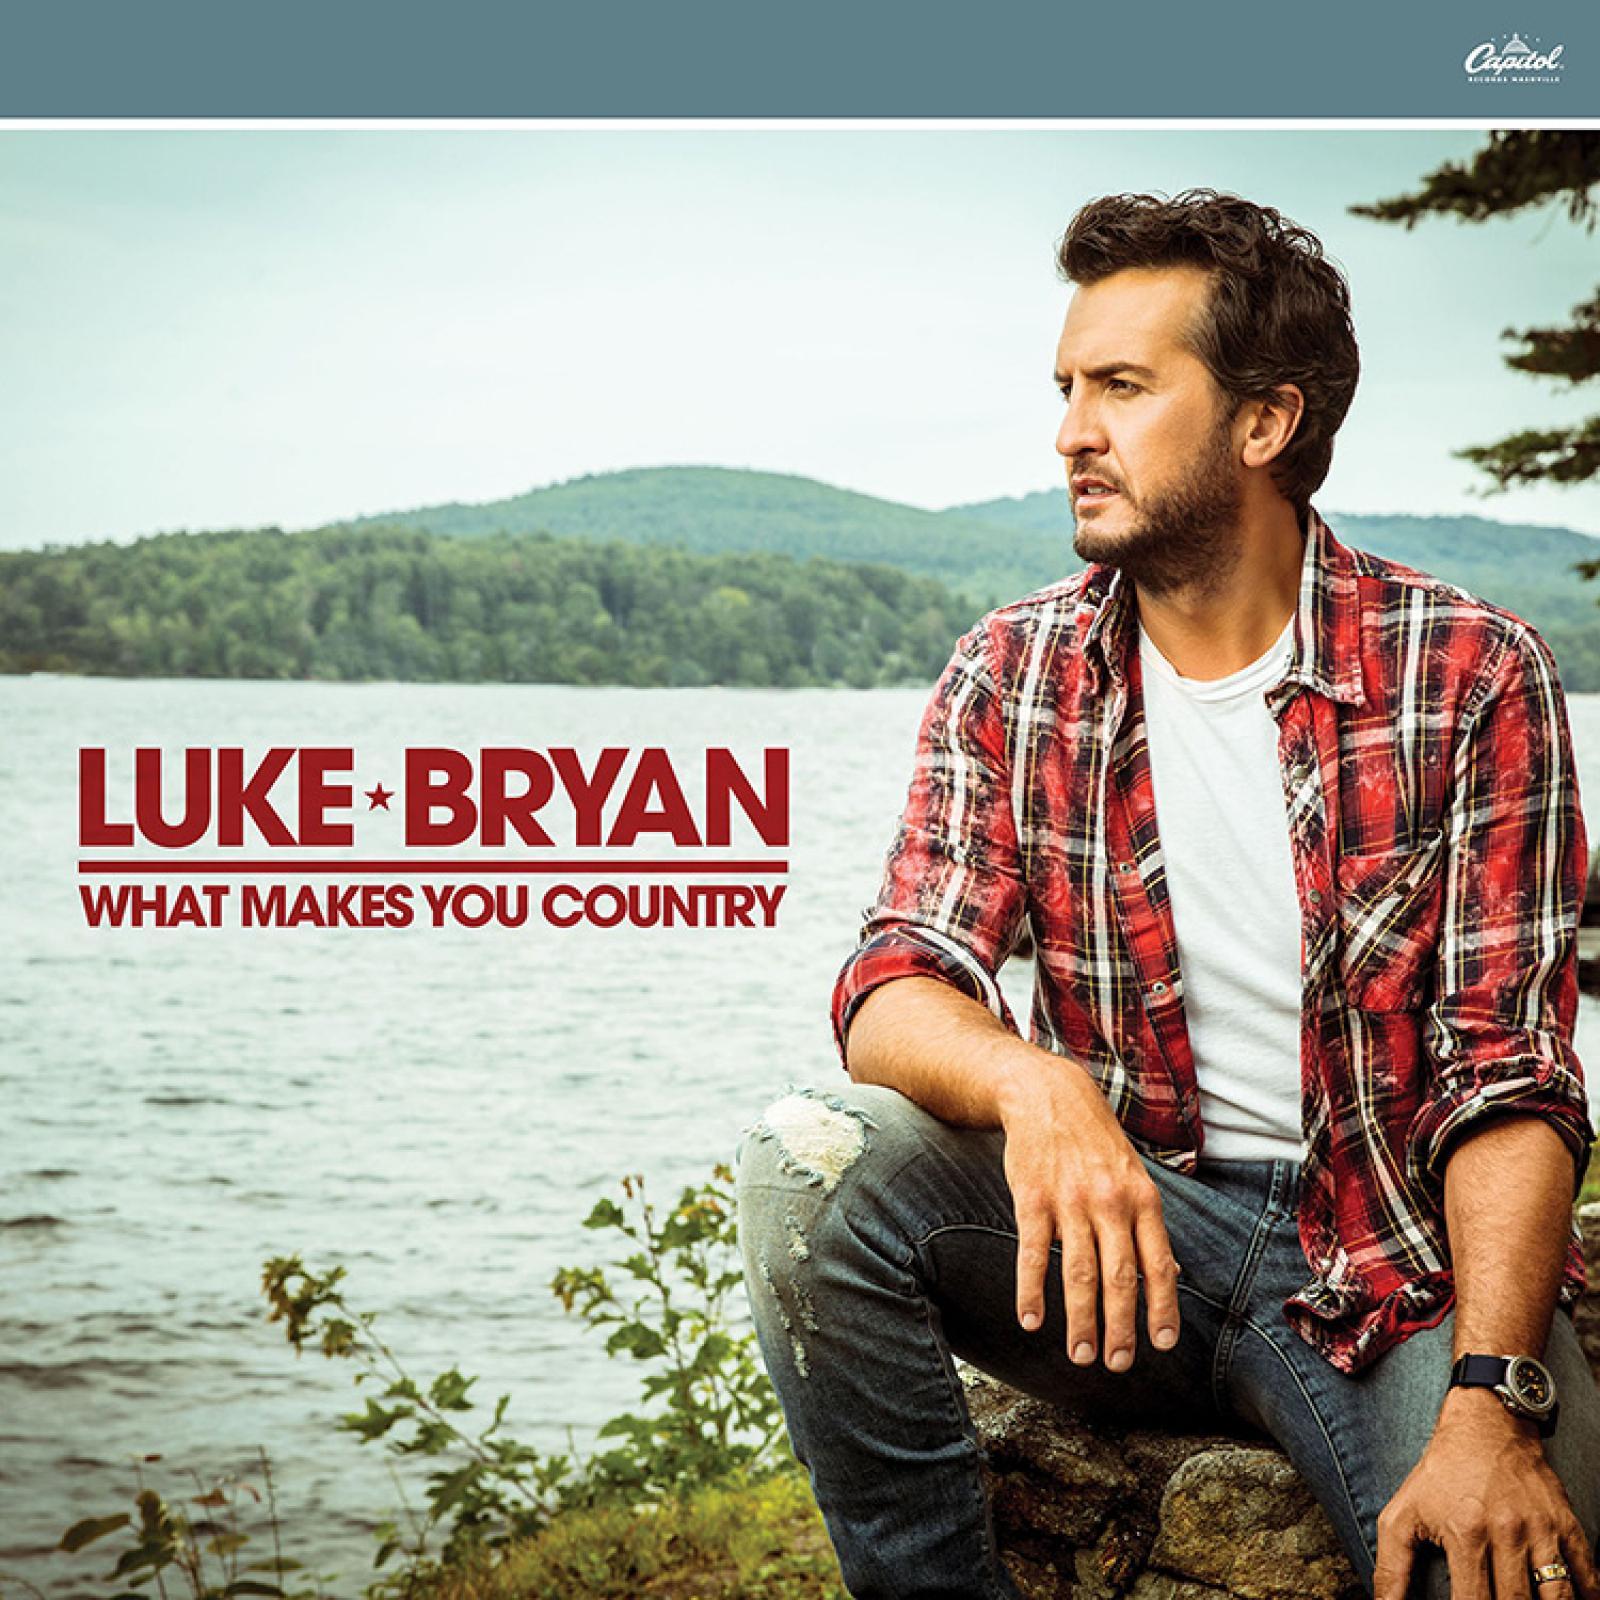 Luke Bryan Lands 20th Career #1 Single with